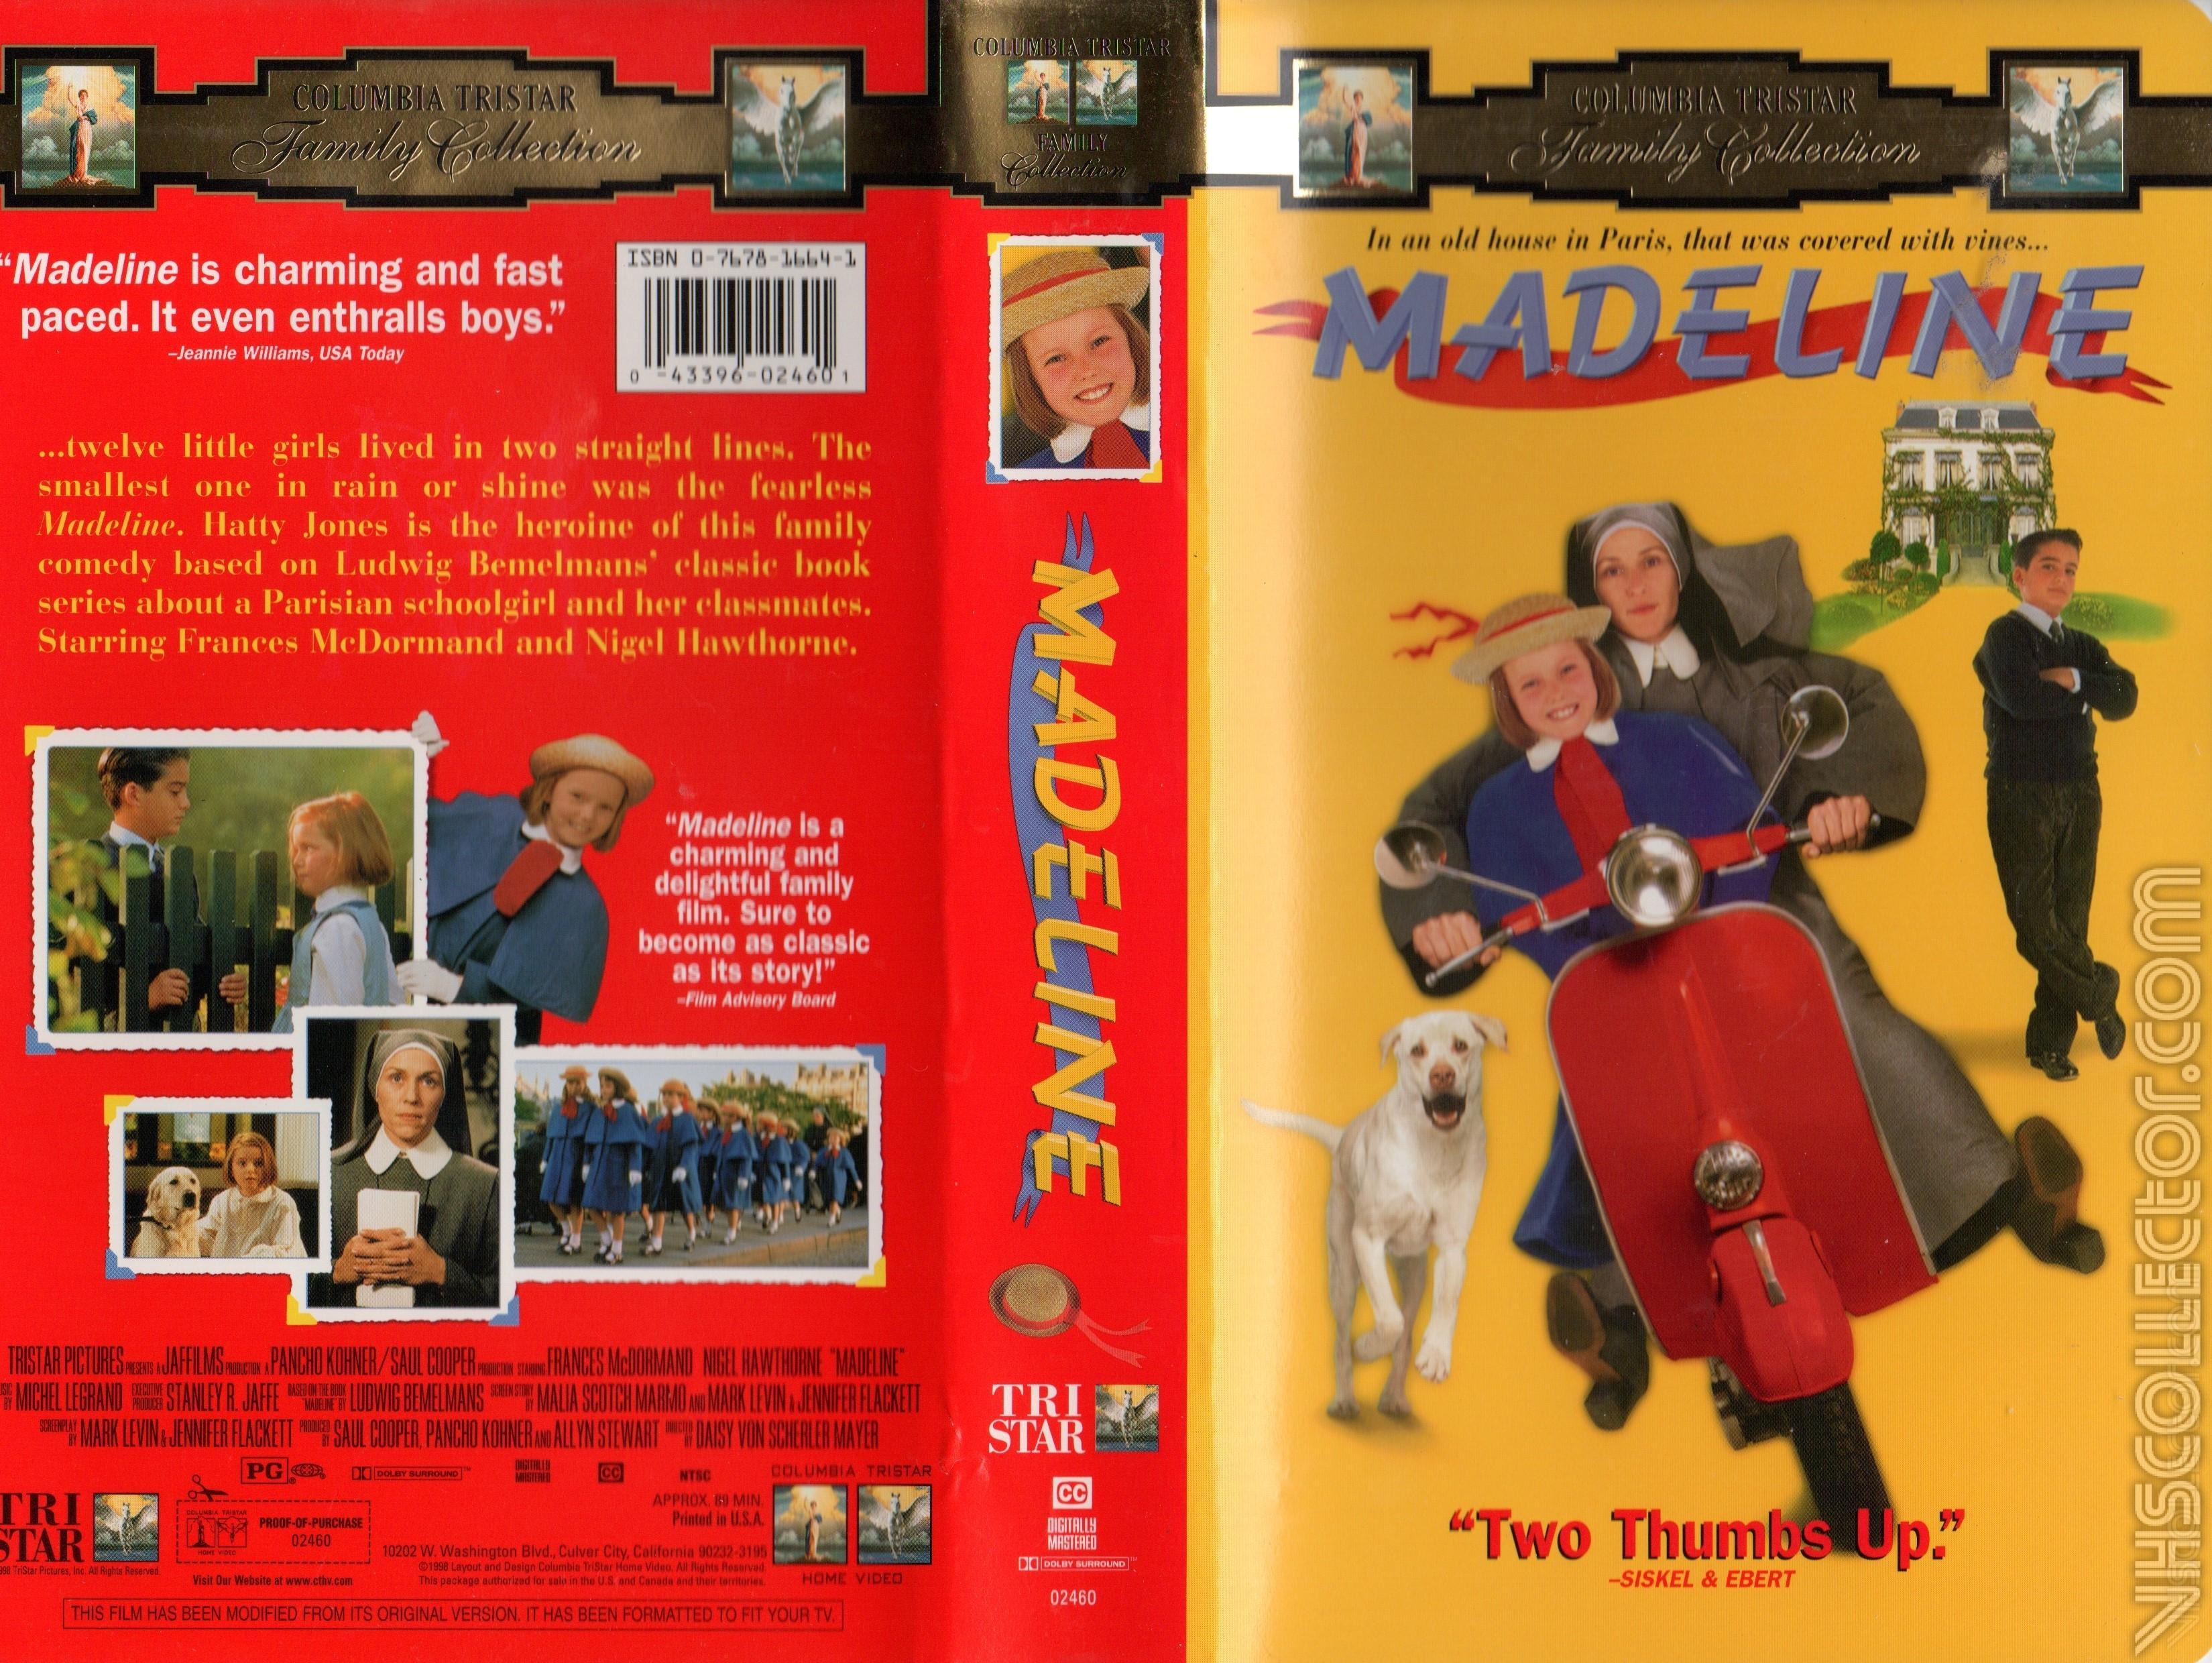 madeline 1998 movie trailer